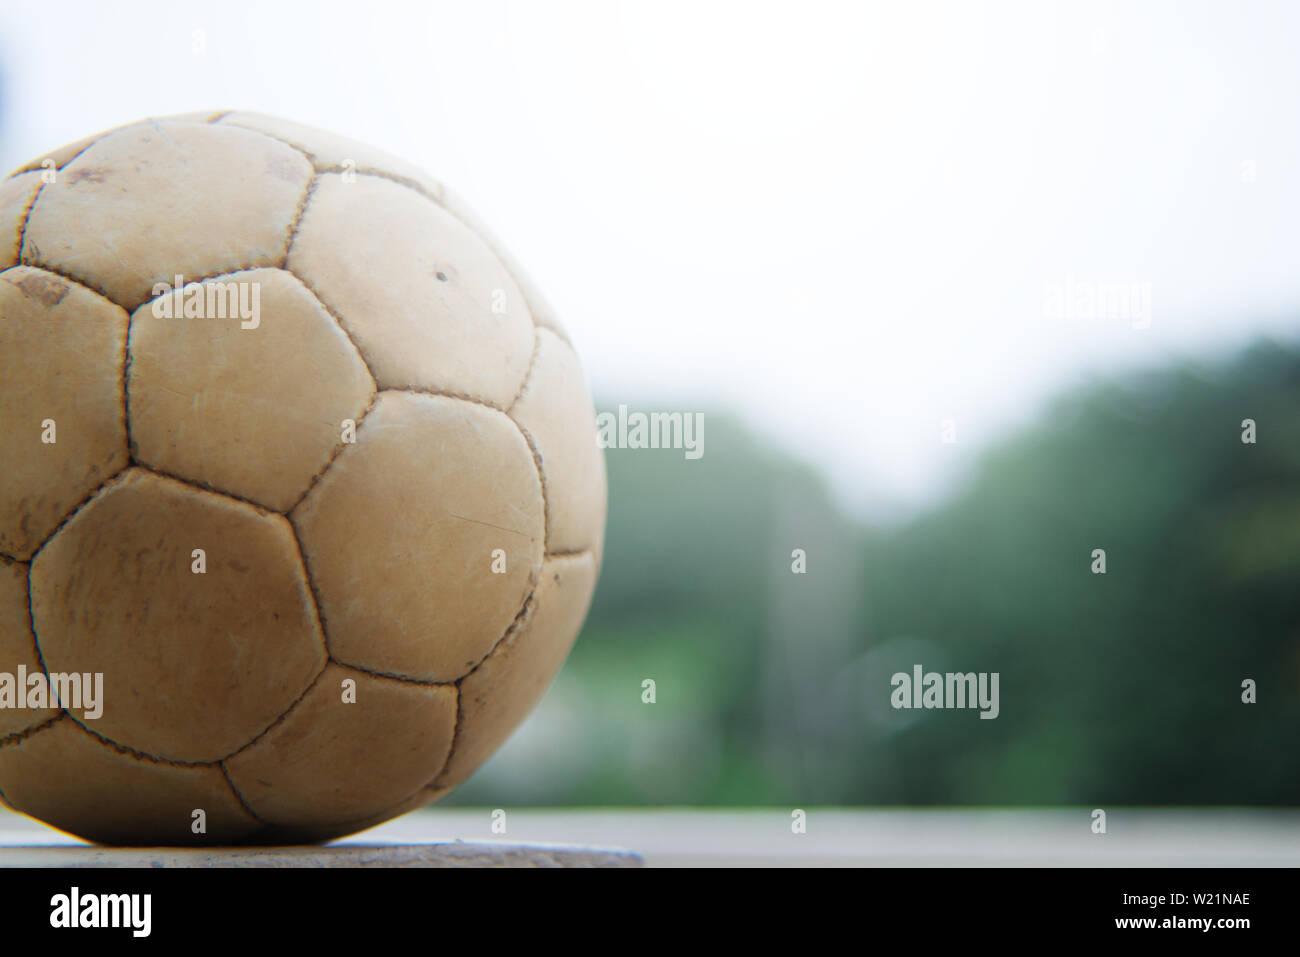 Fussball Auf Dem Boden Wallpaper Stockfoto Bild 259423542